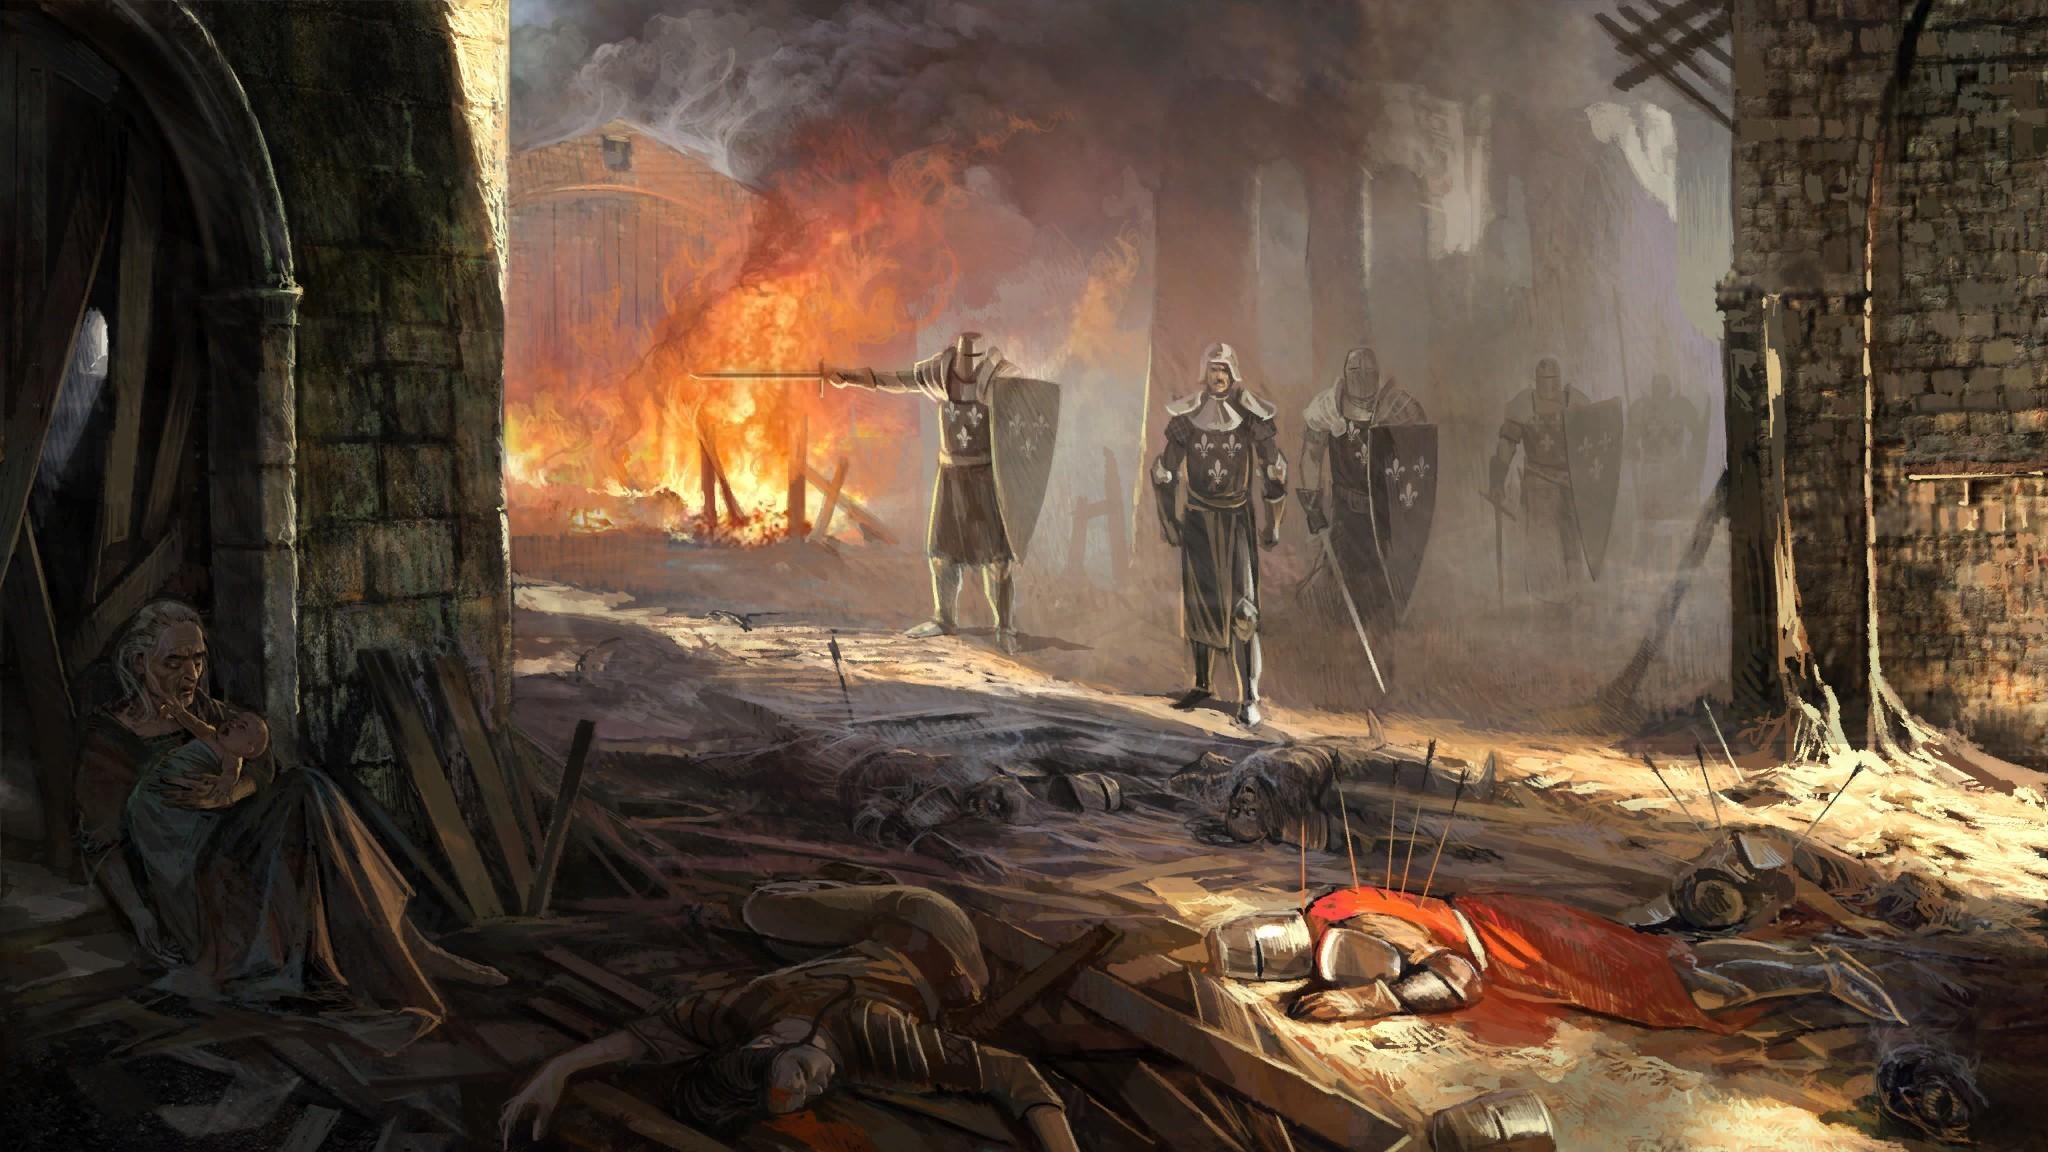 Fantasy battle death knight armor weapons sword wallpaper | |  118280 | WallpaperUP